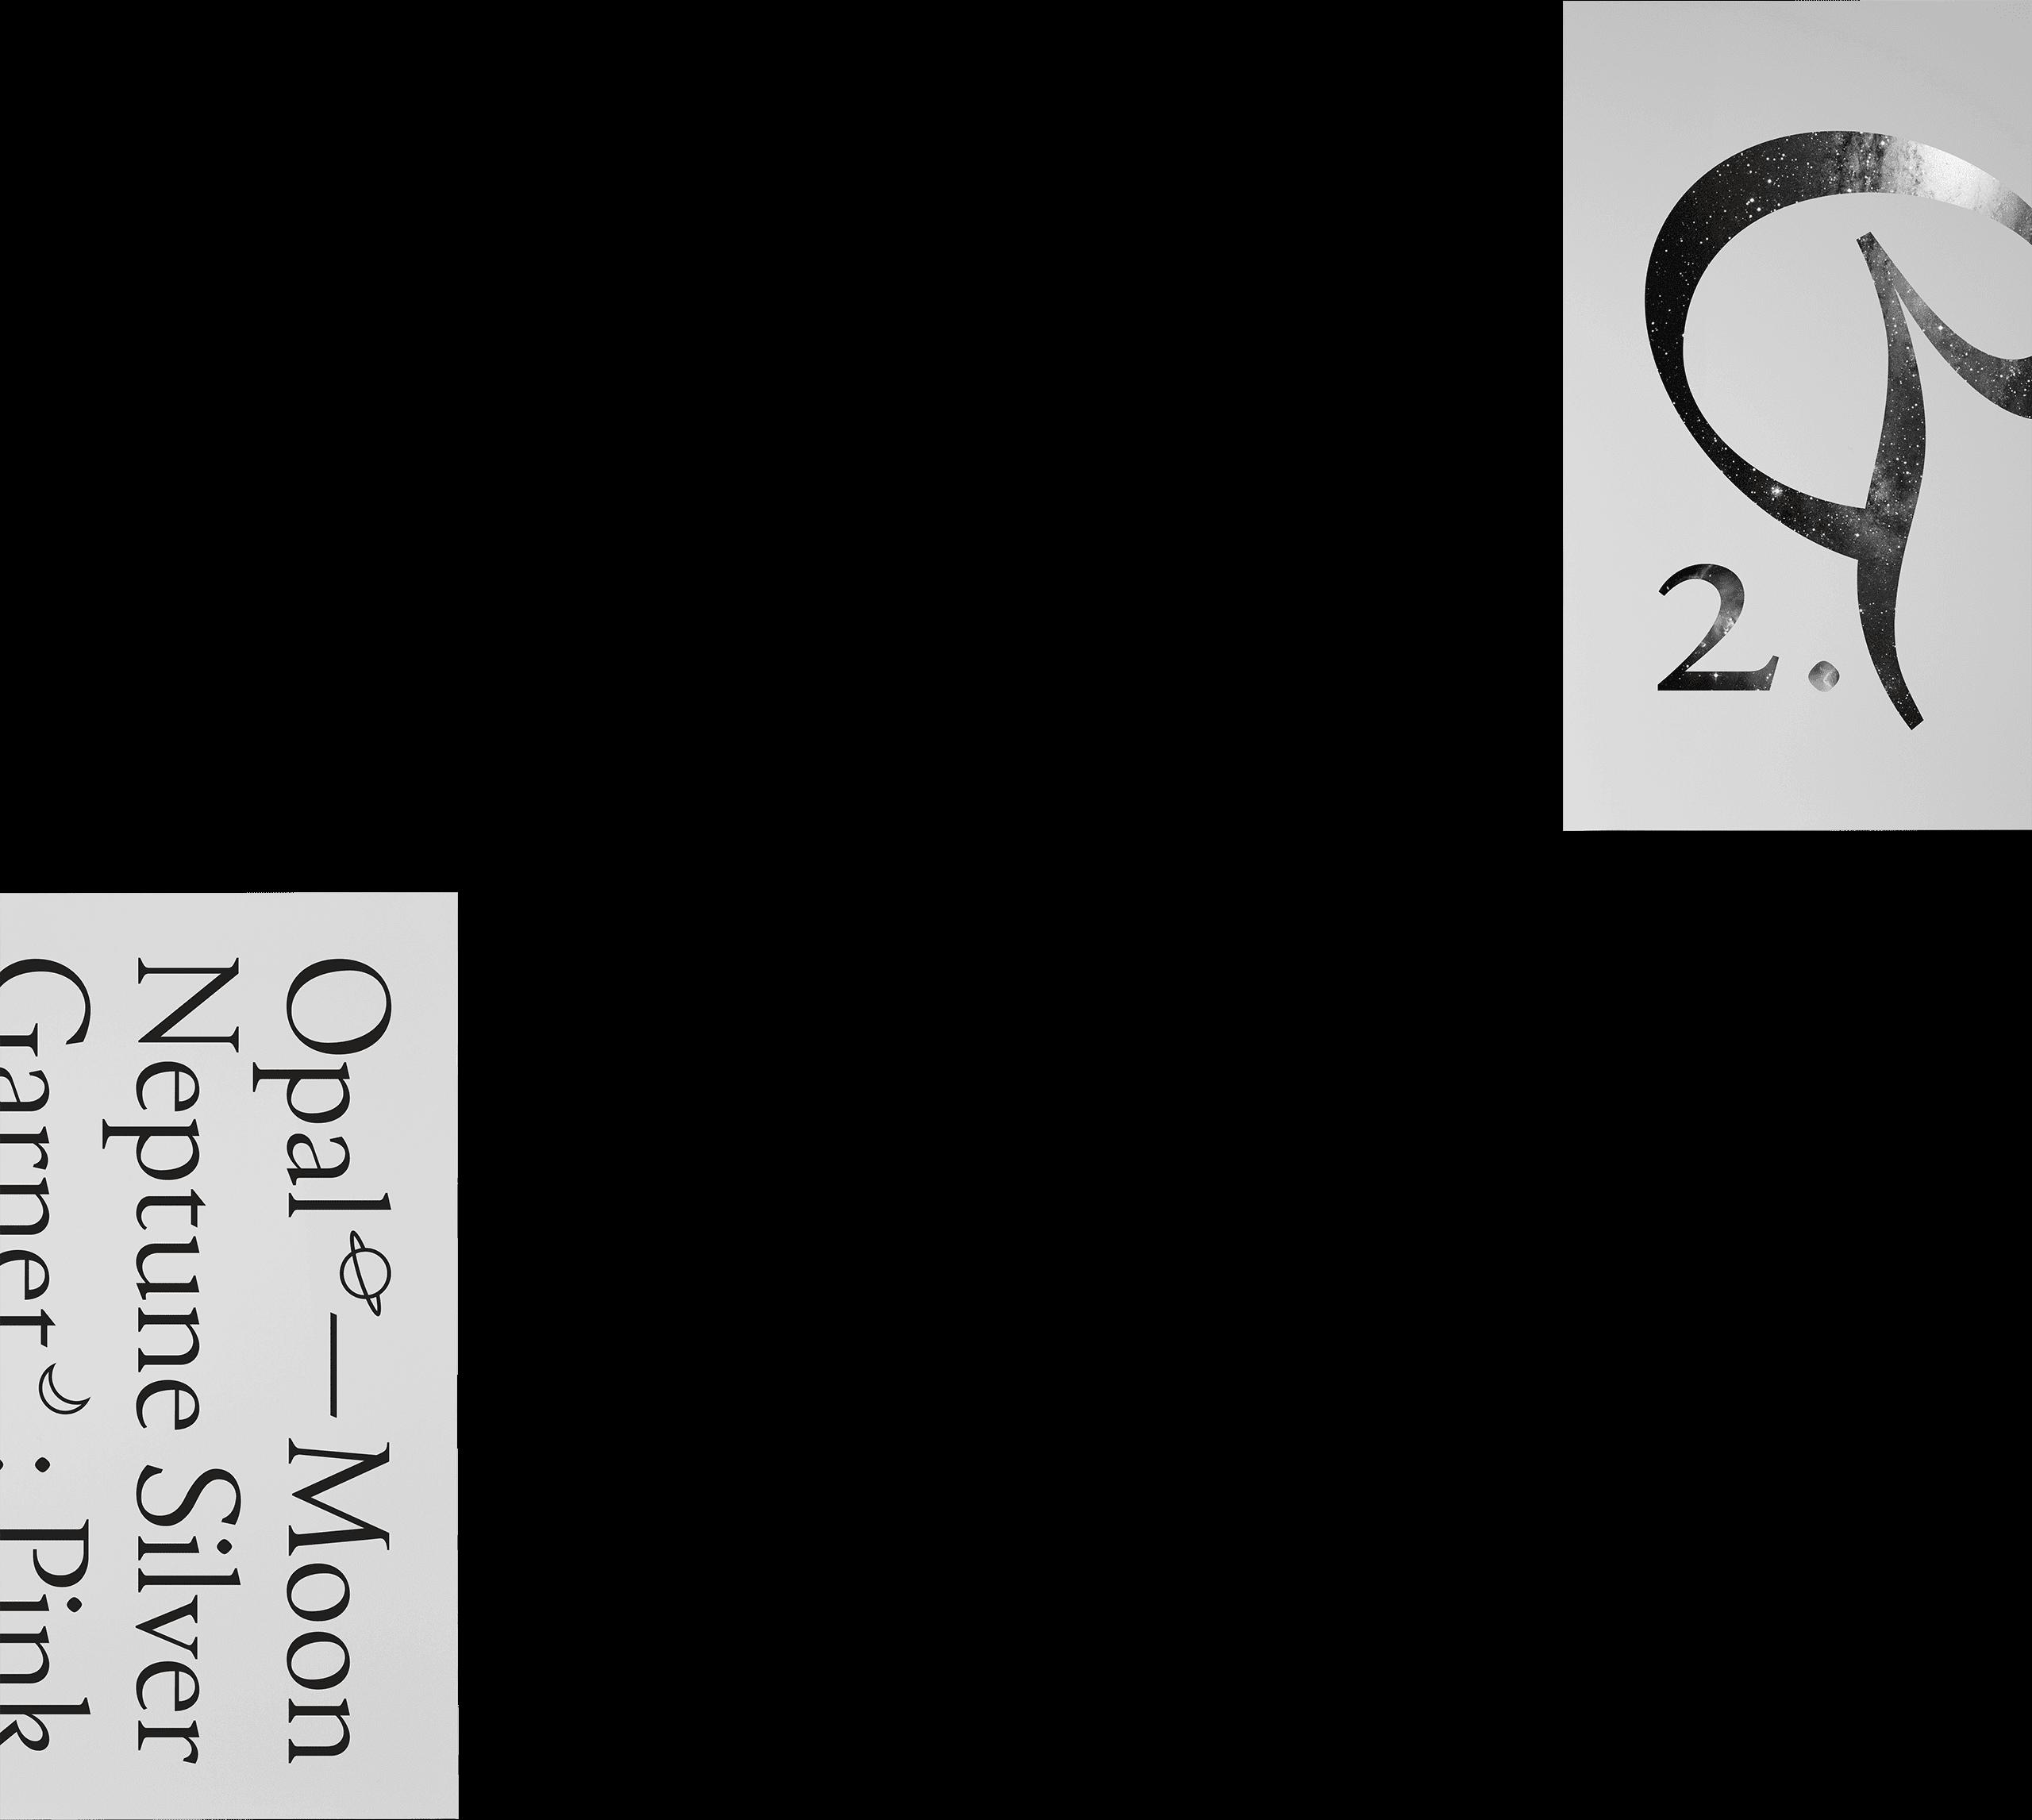 Luna_Poster_for-web-scroll_01-compressor